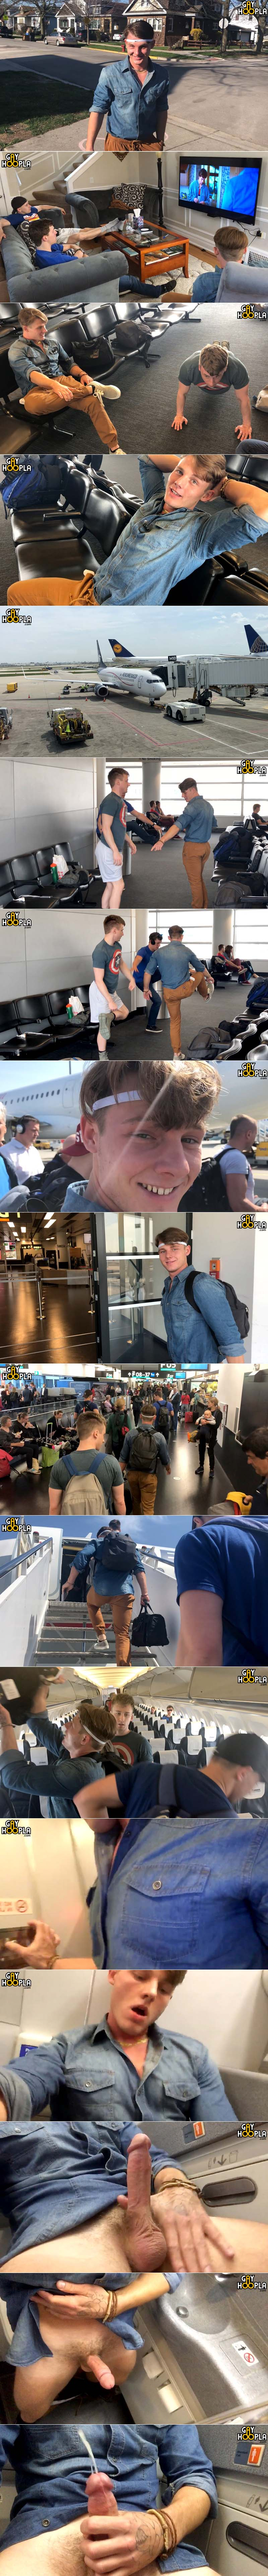 Price Hogan (Jerks Off On Airplane To Europe) at GayHoopla